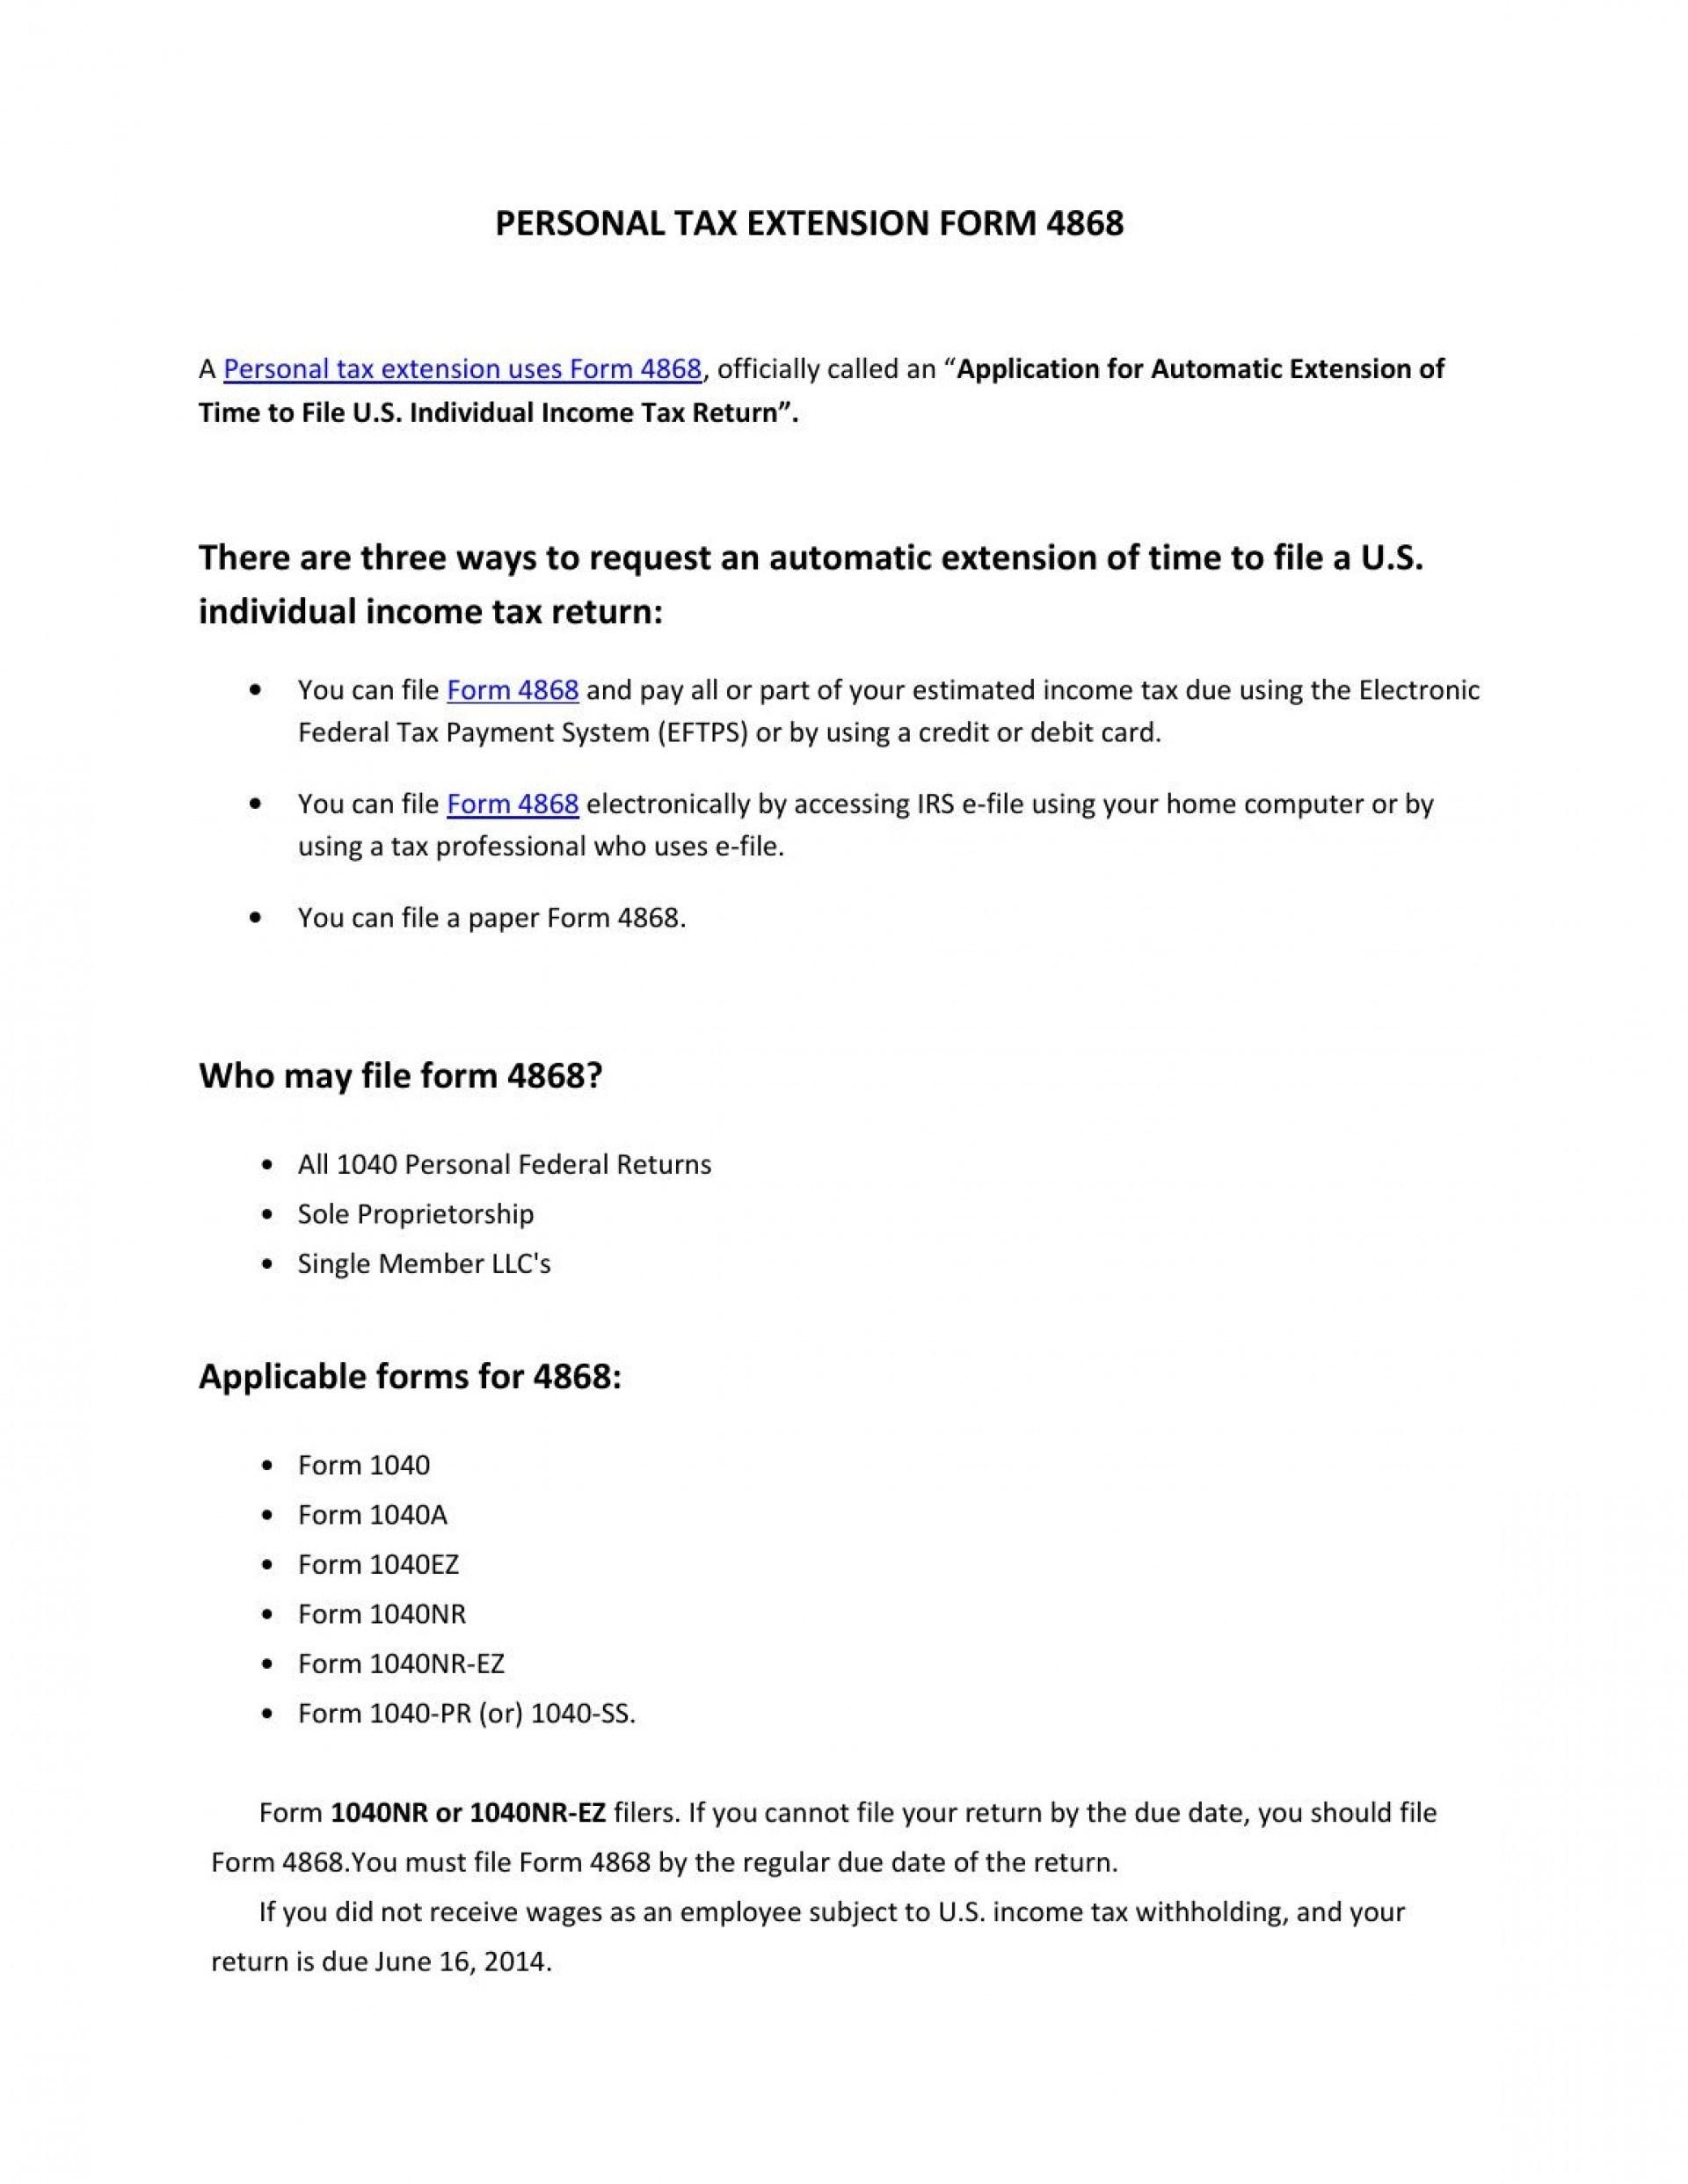 E File Form 4868 Online Free